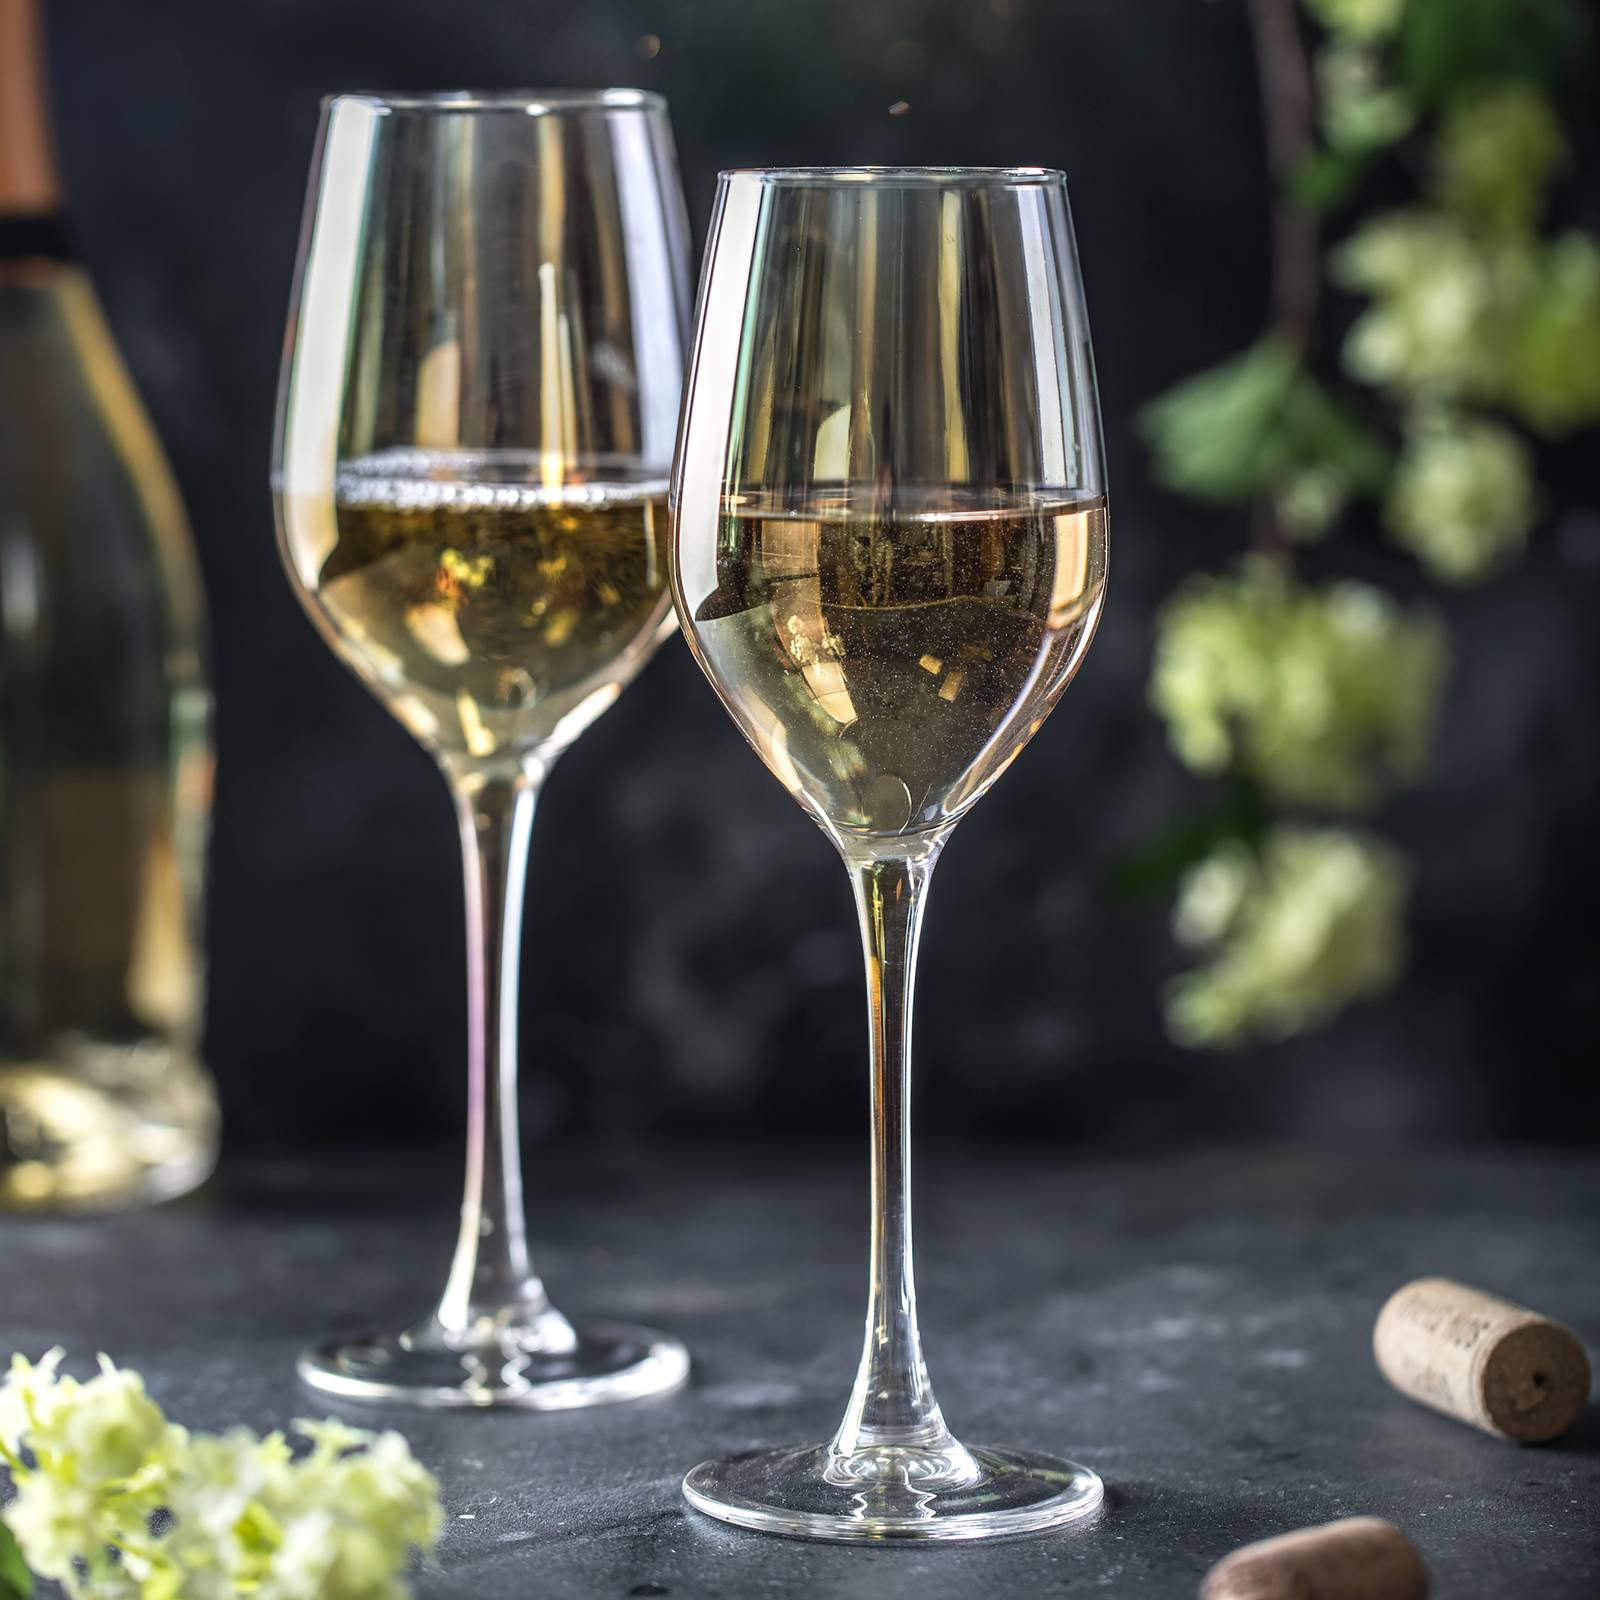 Komplet 6 kieliszków do wina Celeste Golden Chameleon 350 ml LUMINARC